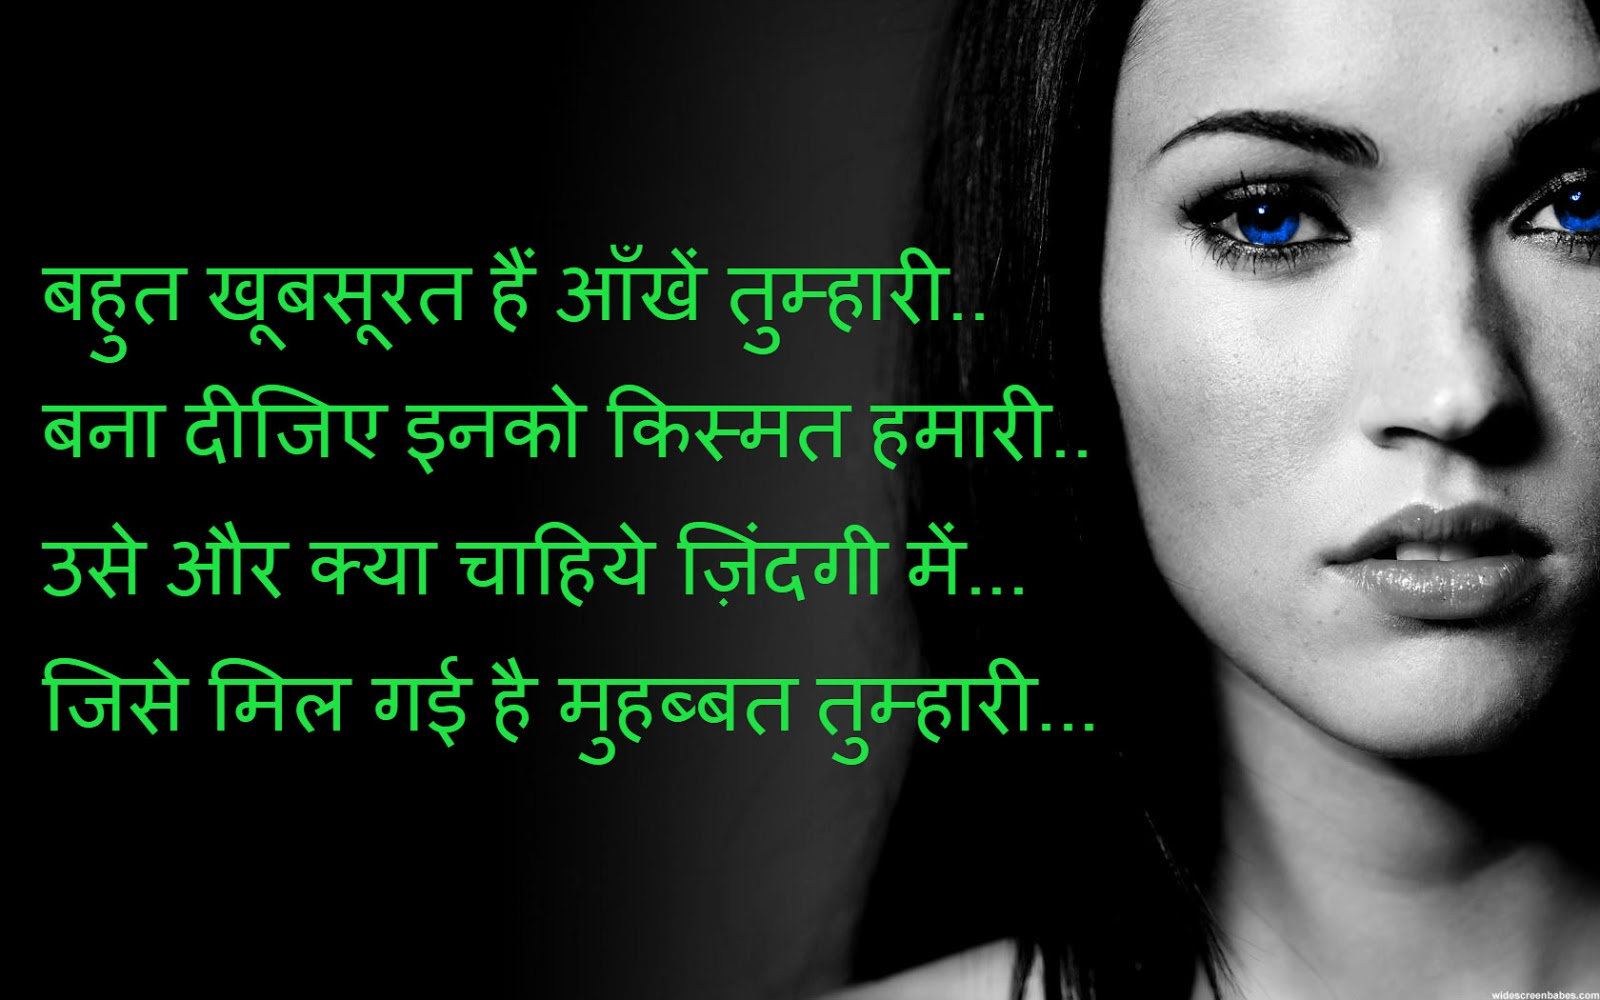 ... Shayari Images shayari ,whatsapp hindi shayari , love shayari , sad